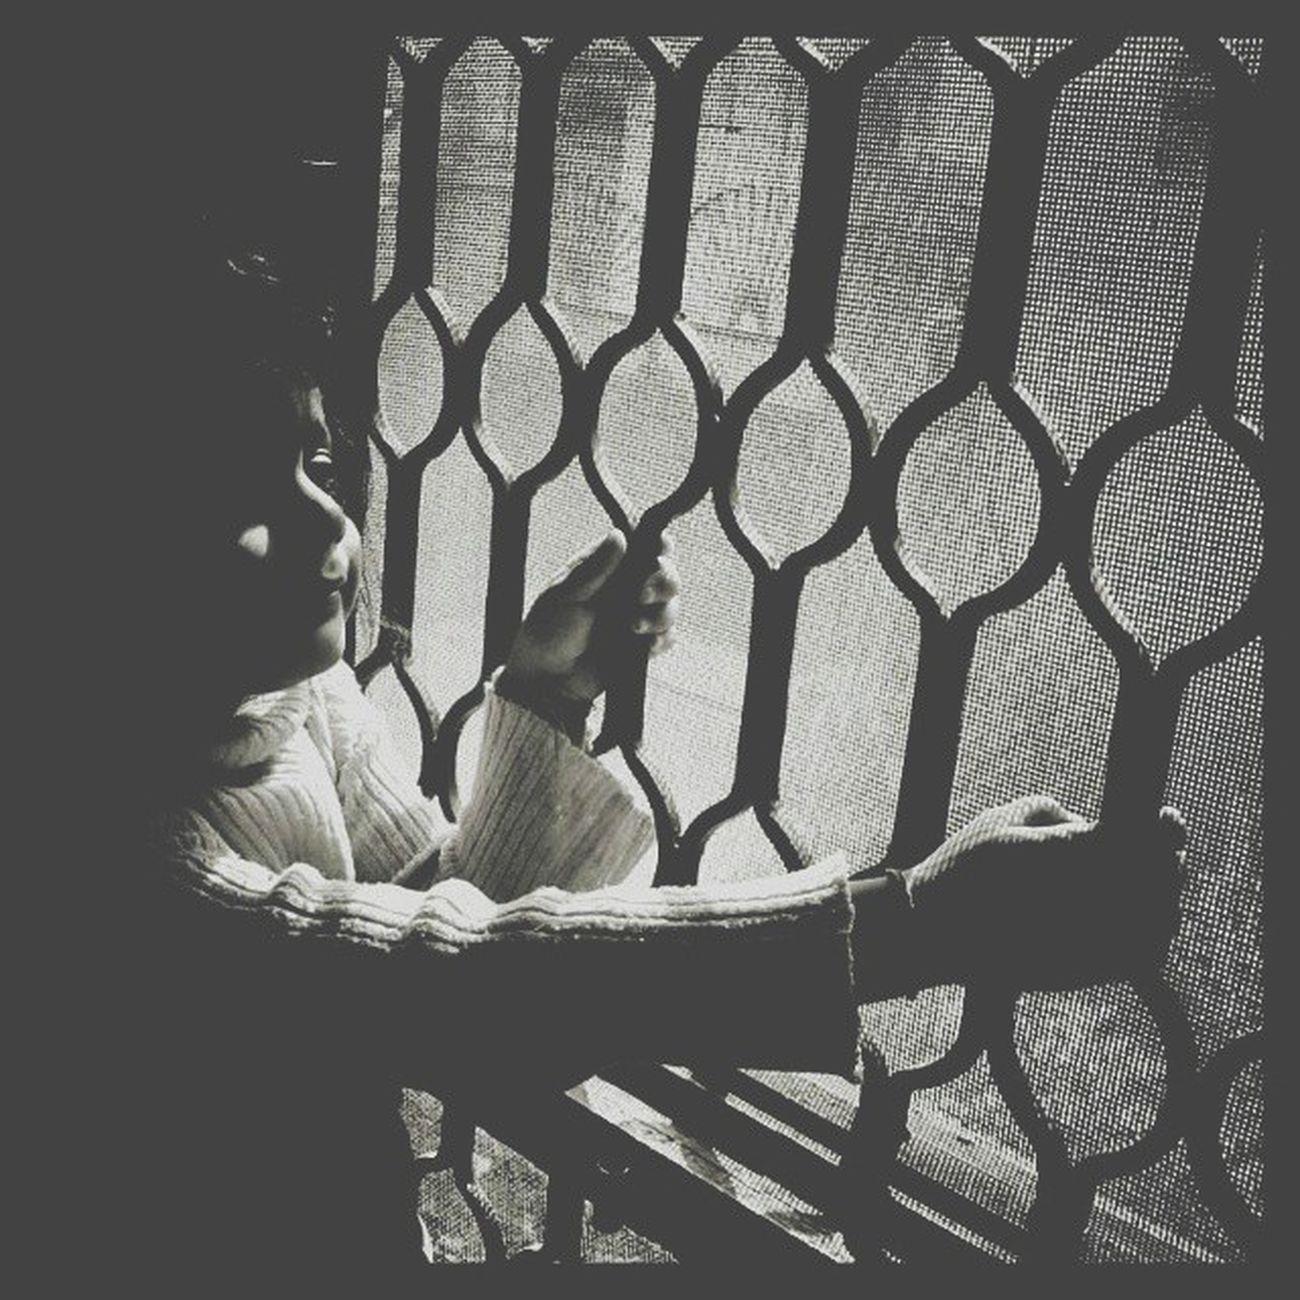 Love Tagsforlikes Divulga Segue Curvy Cleavagemuch Follow4follow Like4like Instalike Singlemom ShoutOut BBMME Instafollow Followme Girl Punjabi Kikme Lesbian SuicideGirls Lindas Indiangirl Follow Meigas WhatsApp Snapchat